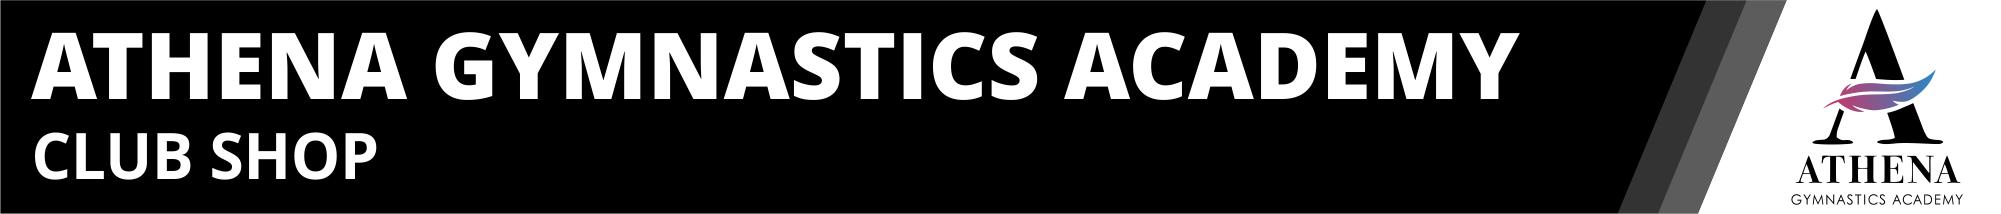 athena-gymnastics-academy-club-shop-banner.png